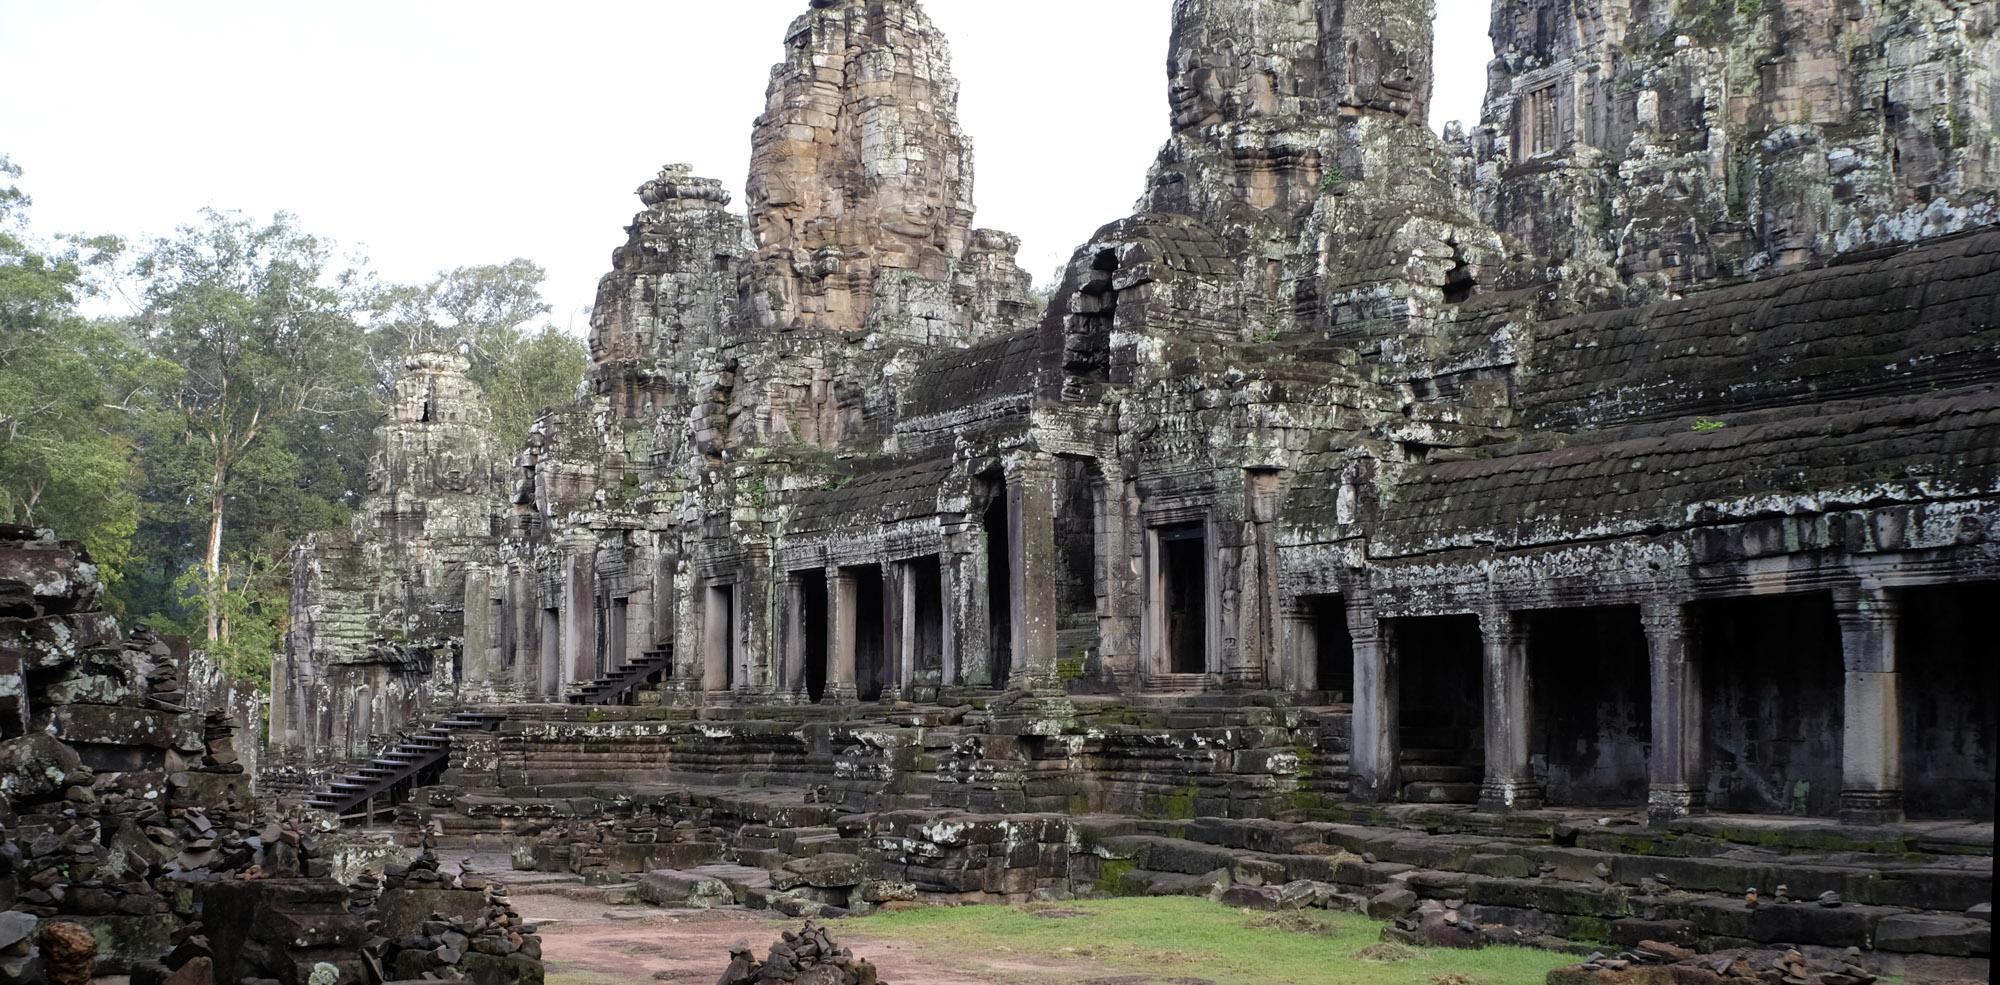 reise-ansichten Angkor Tom Baron